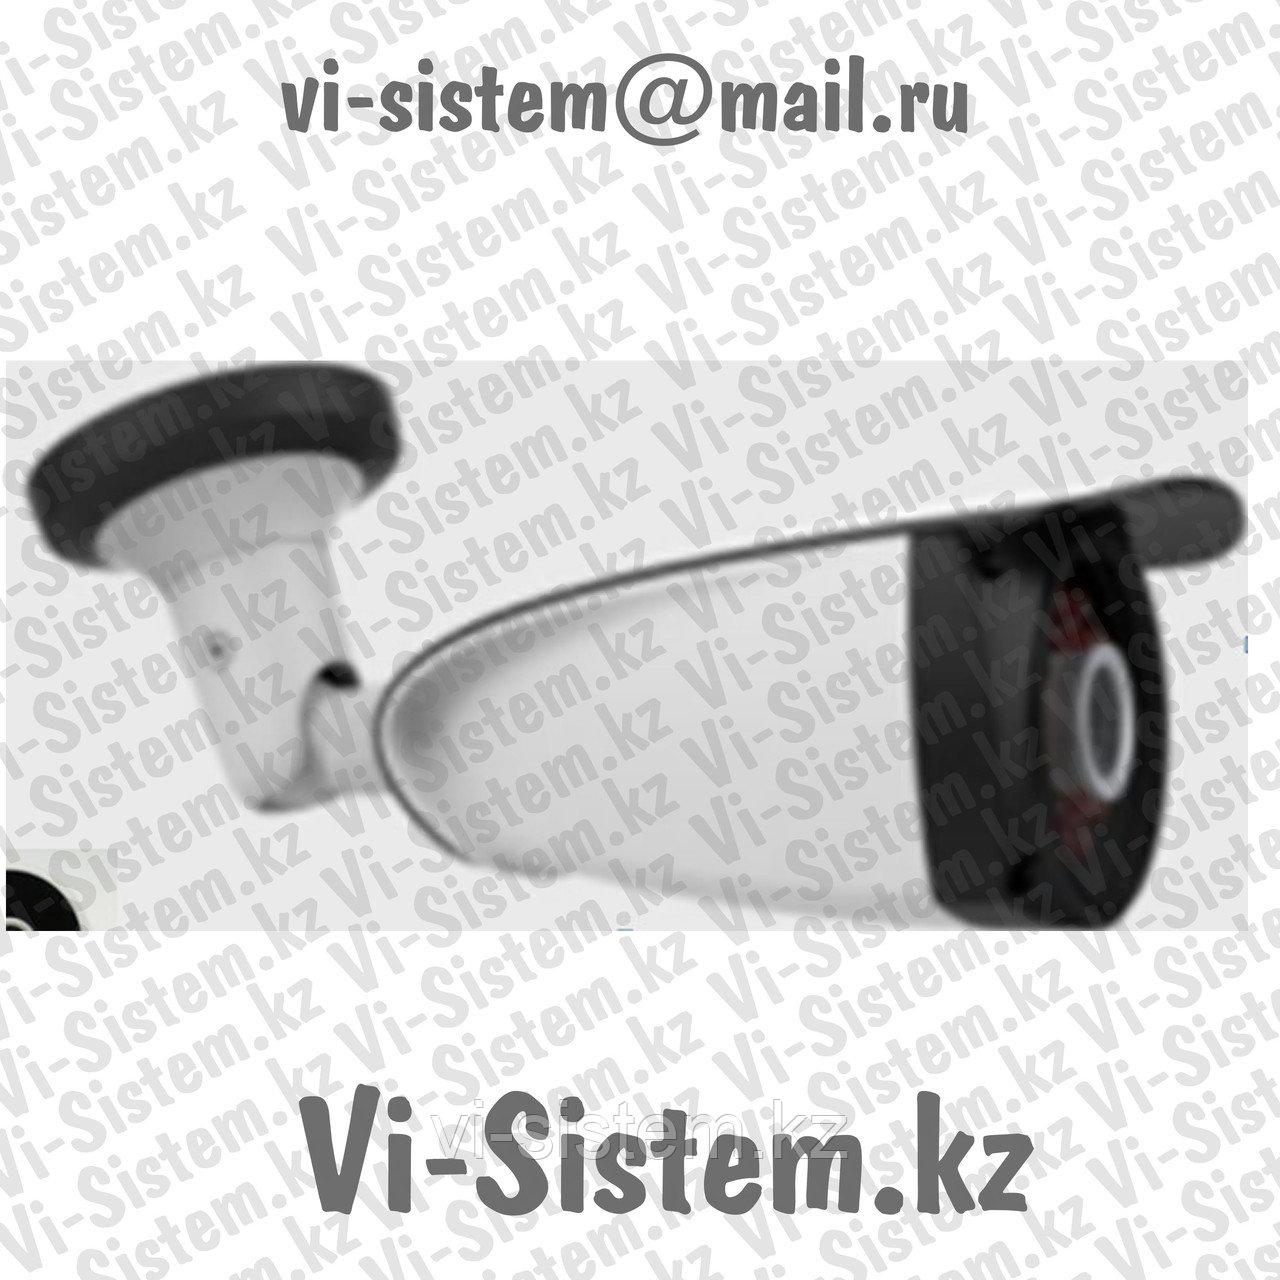 IP-Видеокамера SYNQAR IP-291 2MP POE